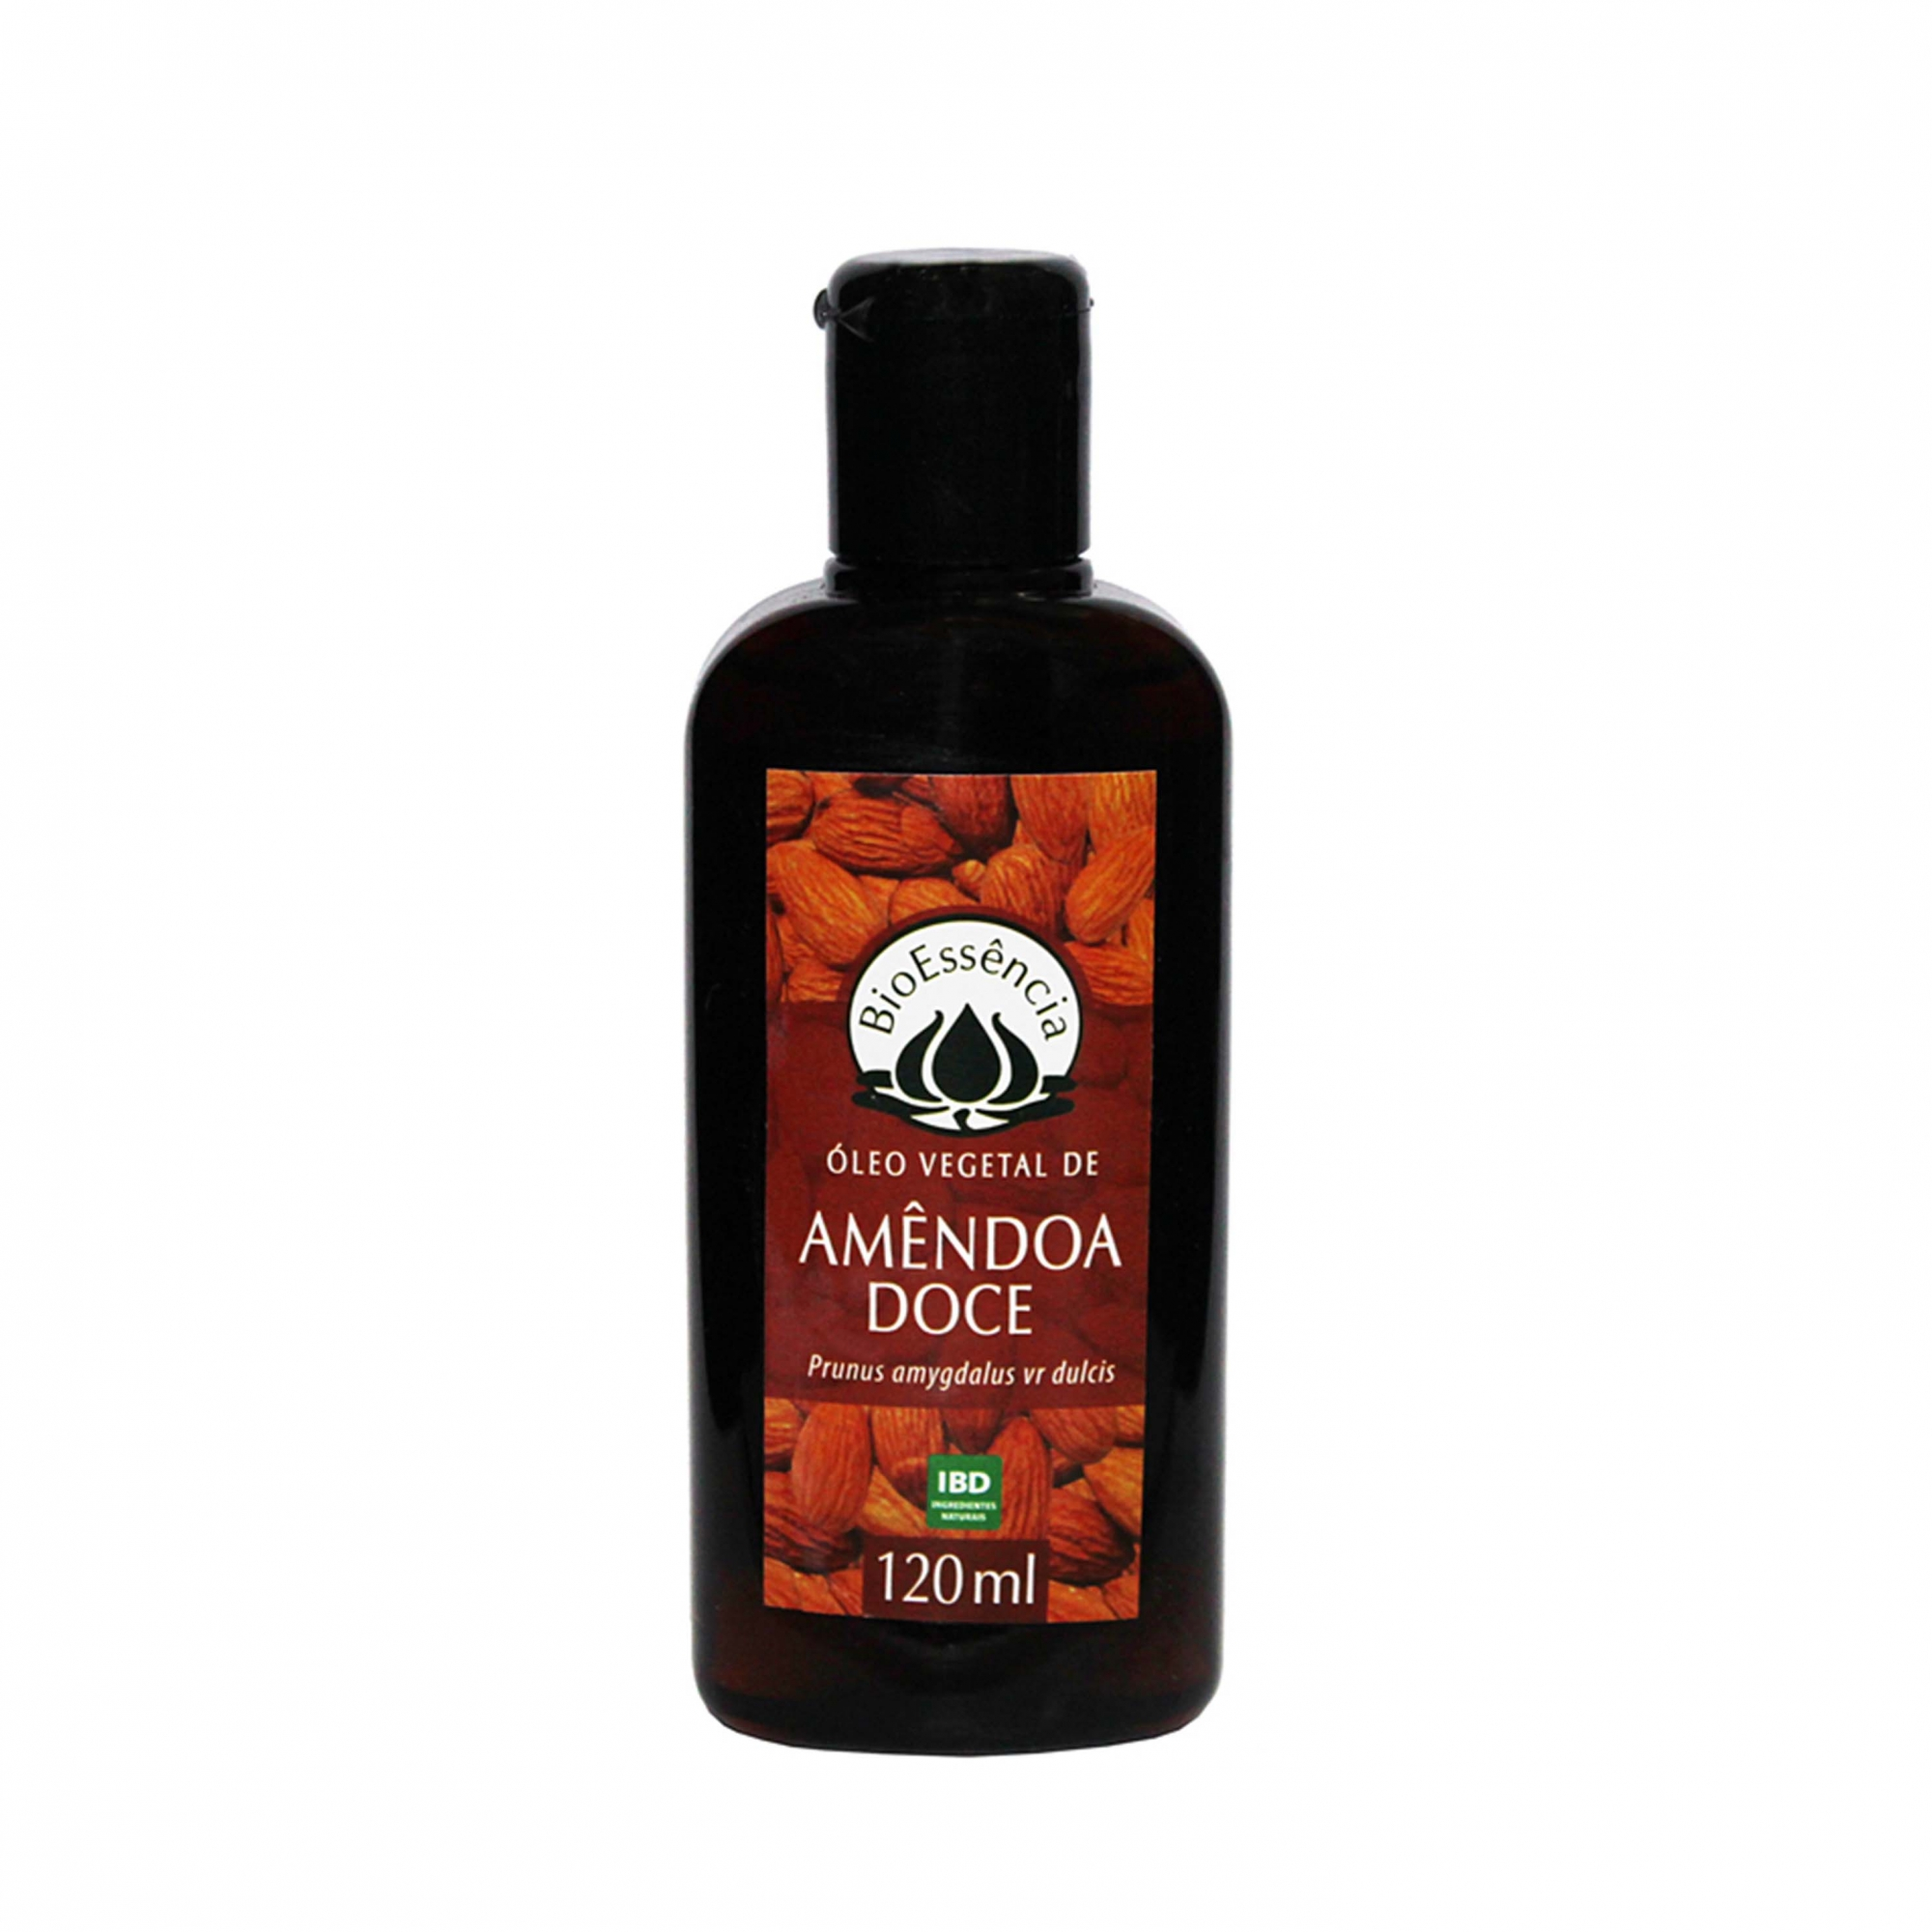 Óleo Vegetal de Amendoa Doce - 120 ml